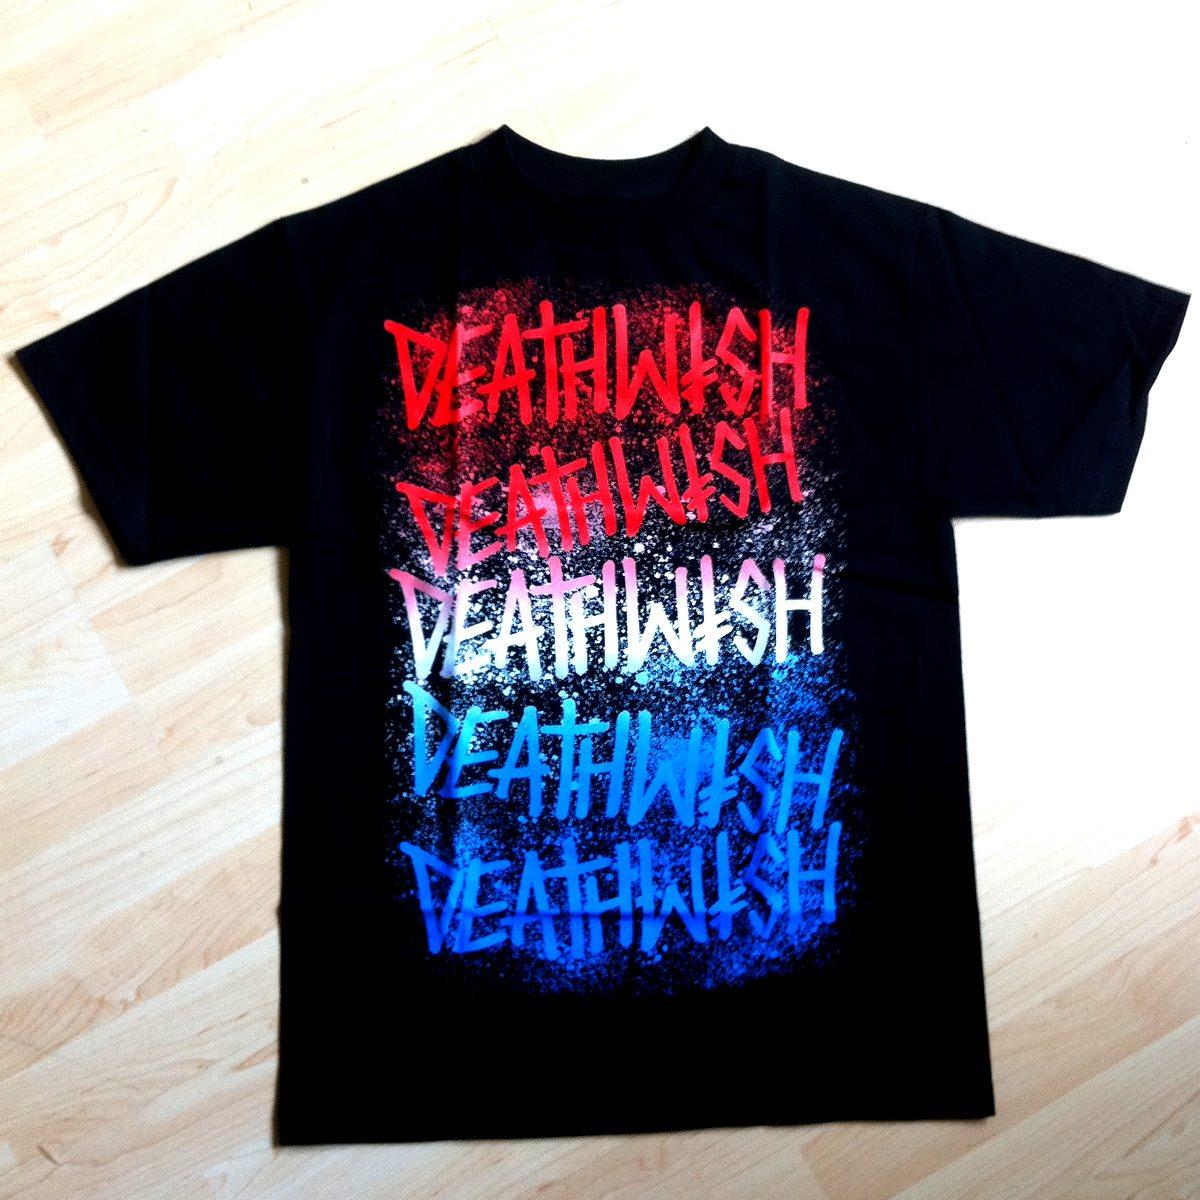 Deathwish Shirt Stacks Black - Red/White/Blue